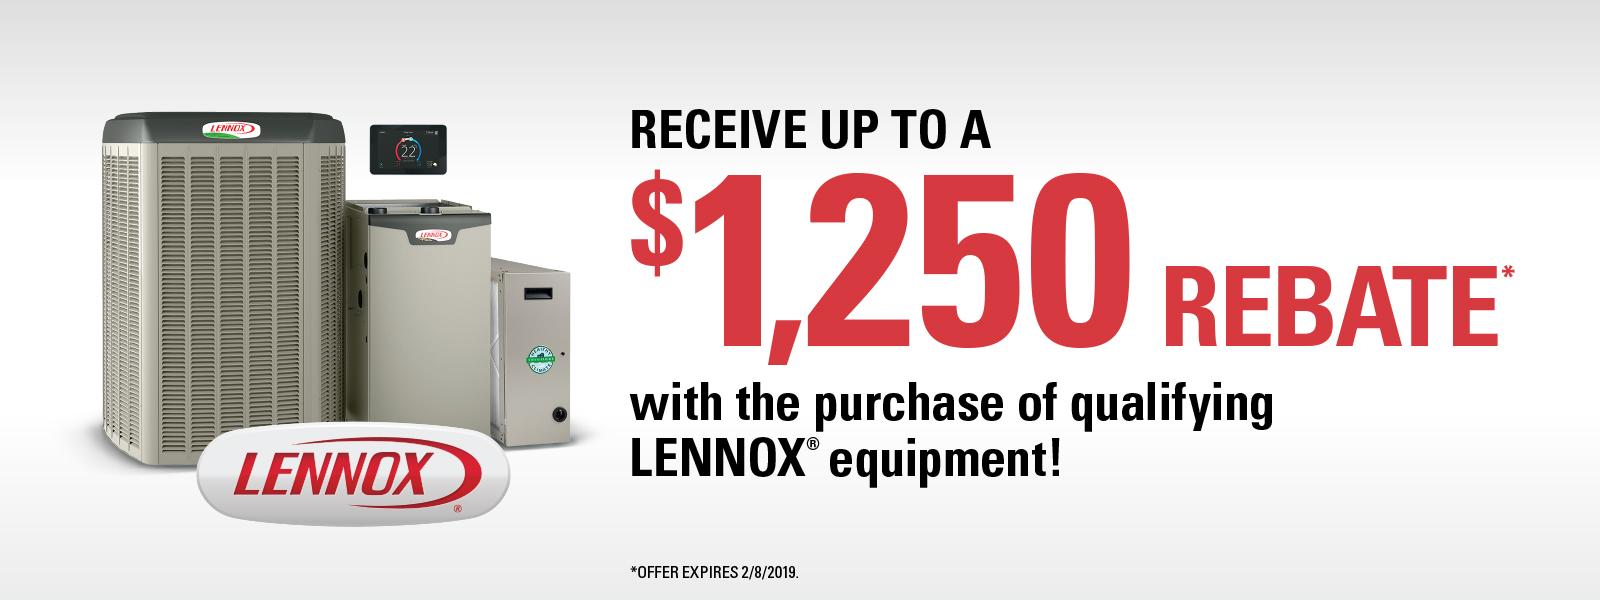 Lennox Promotion